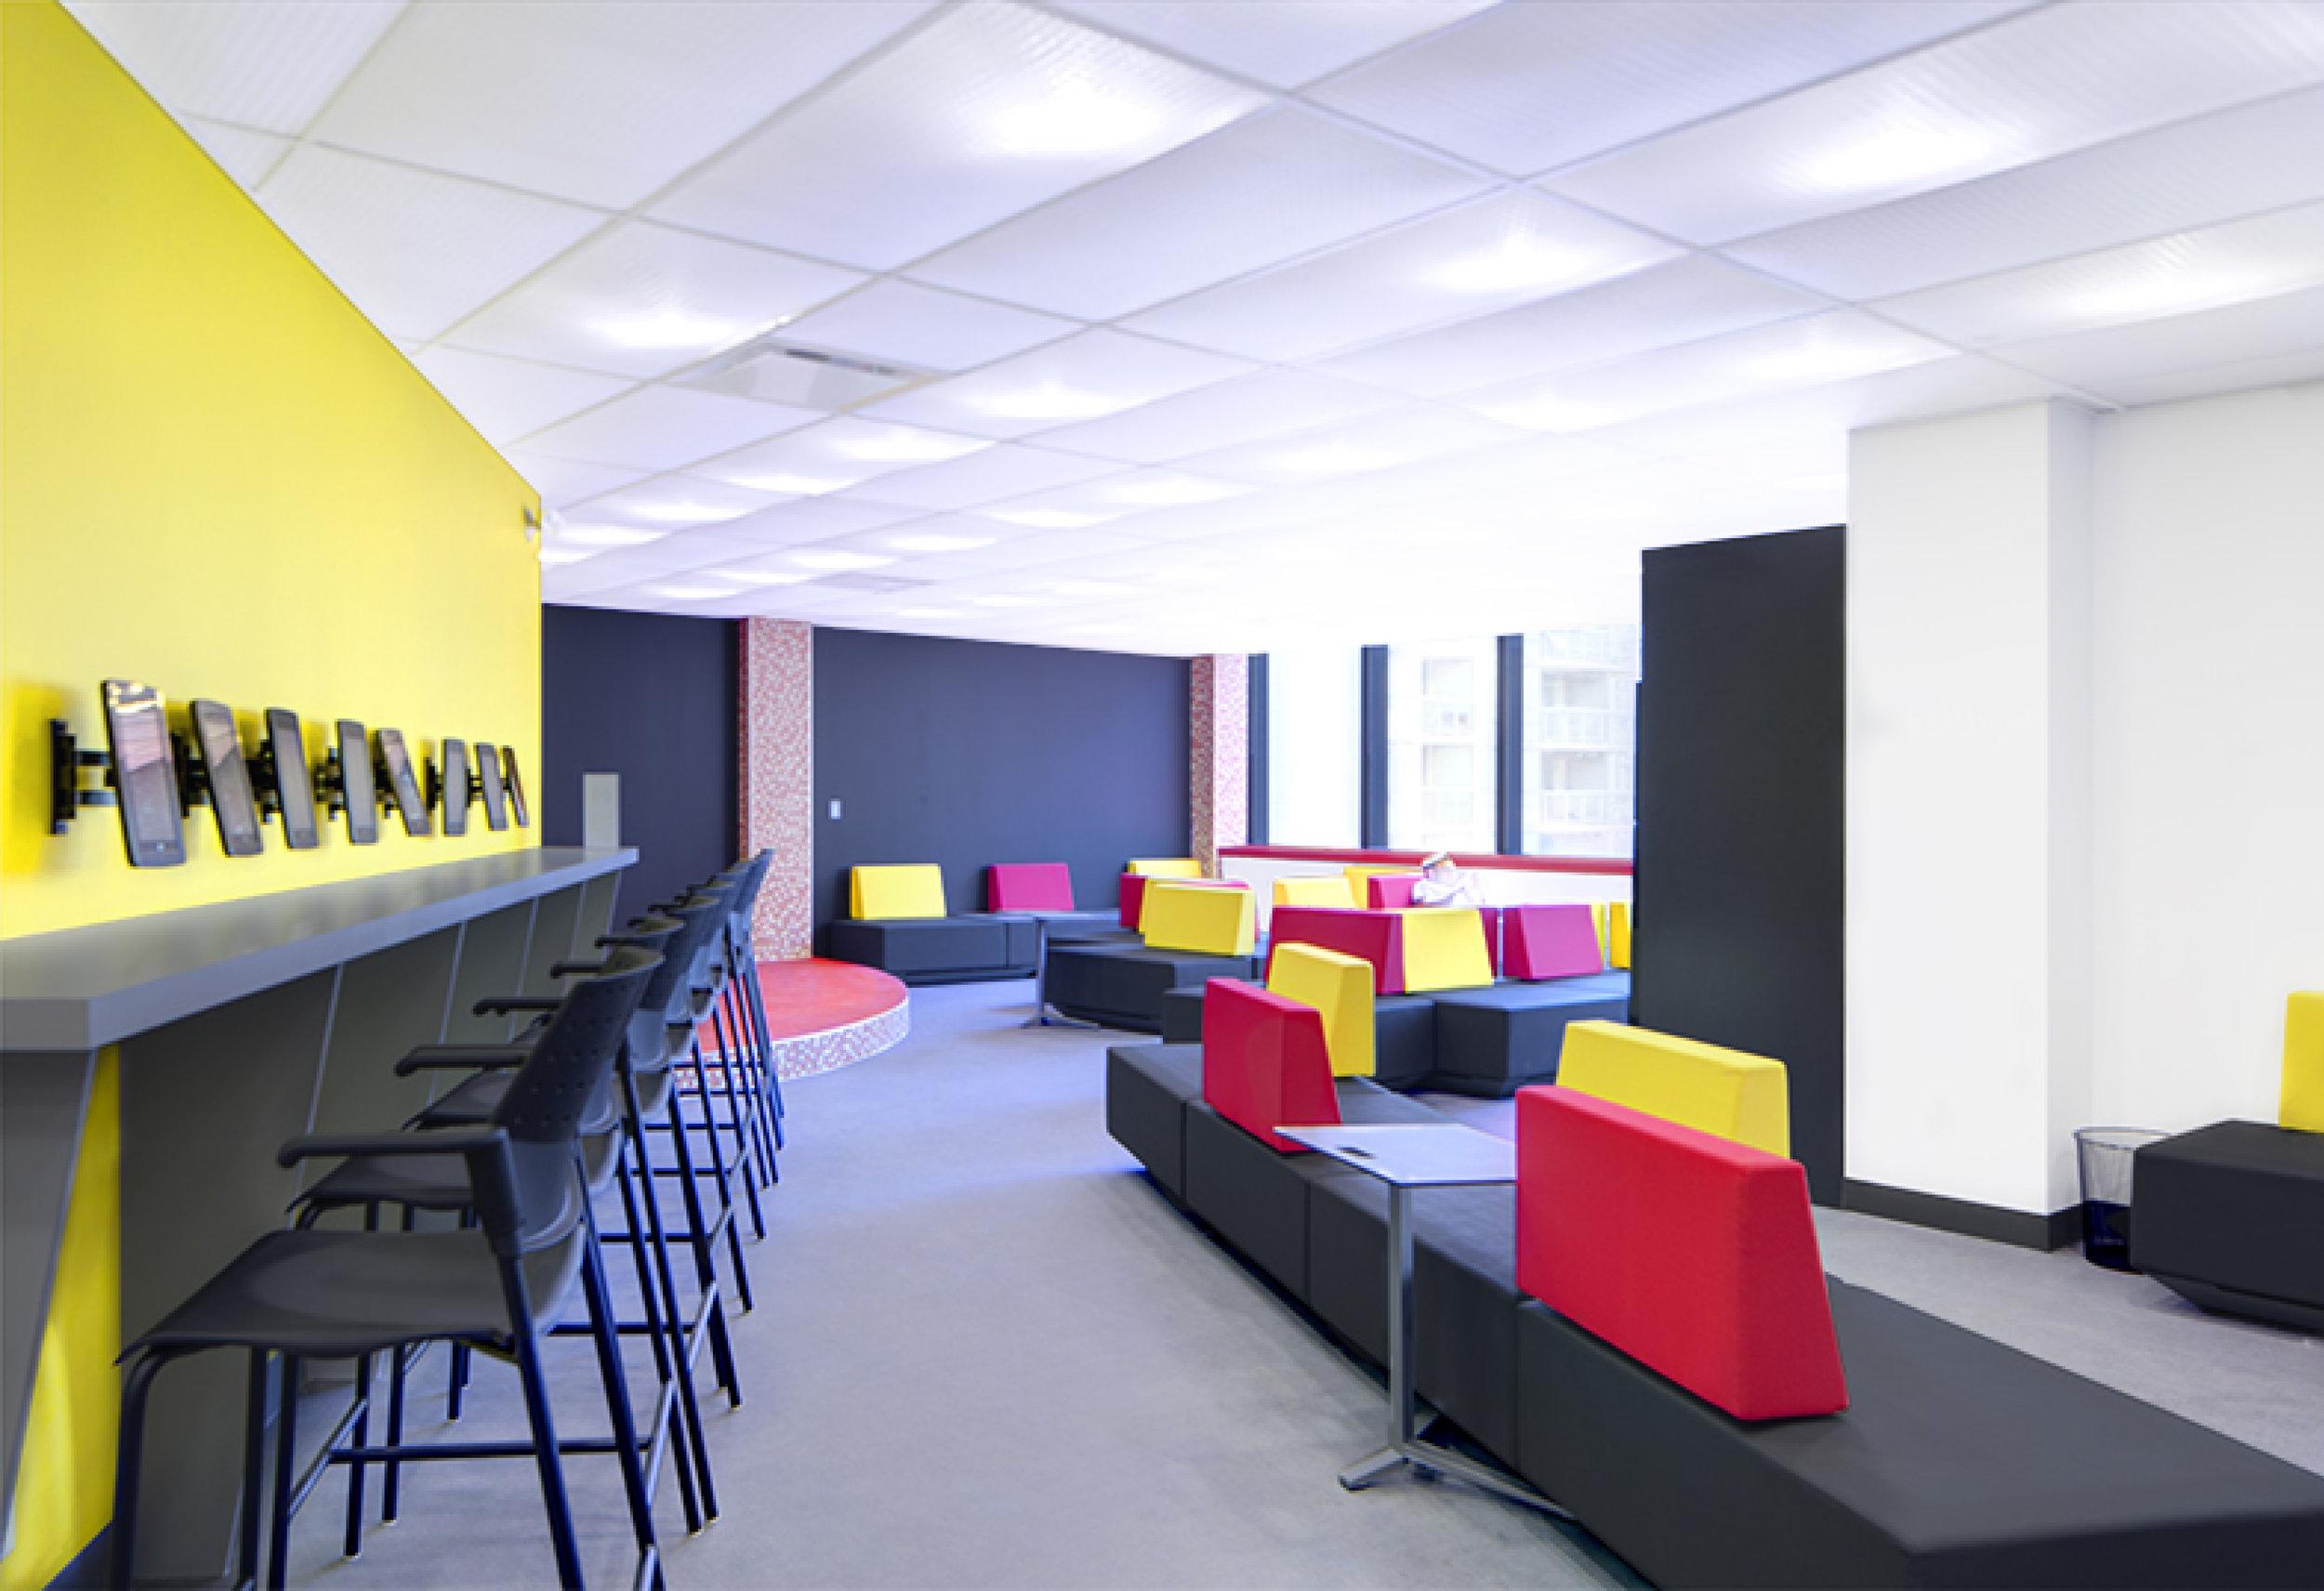 interior why design architecture construction choose programs measures success of utsa academic cida college and